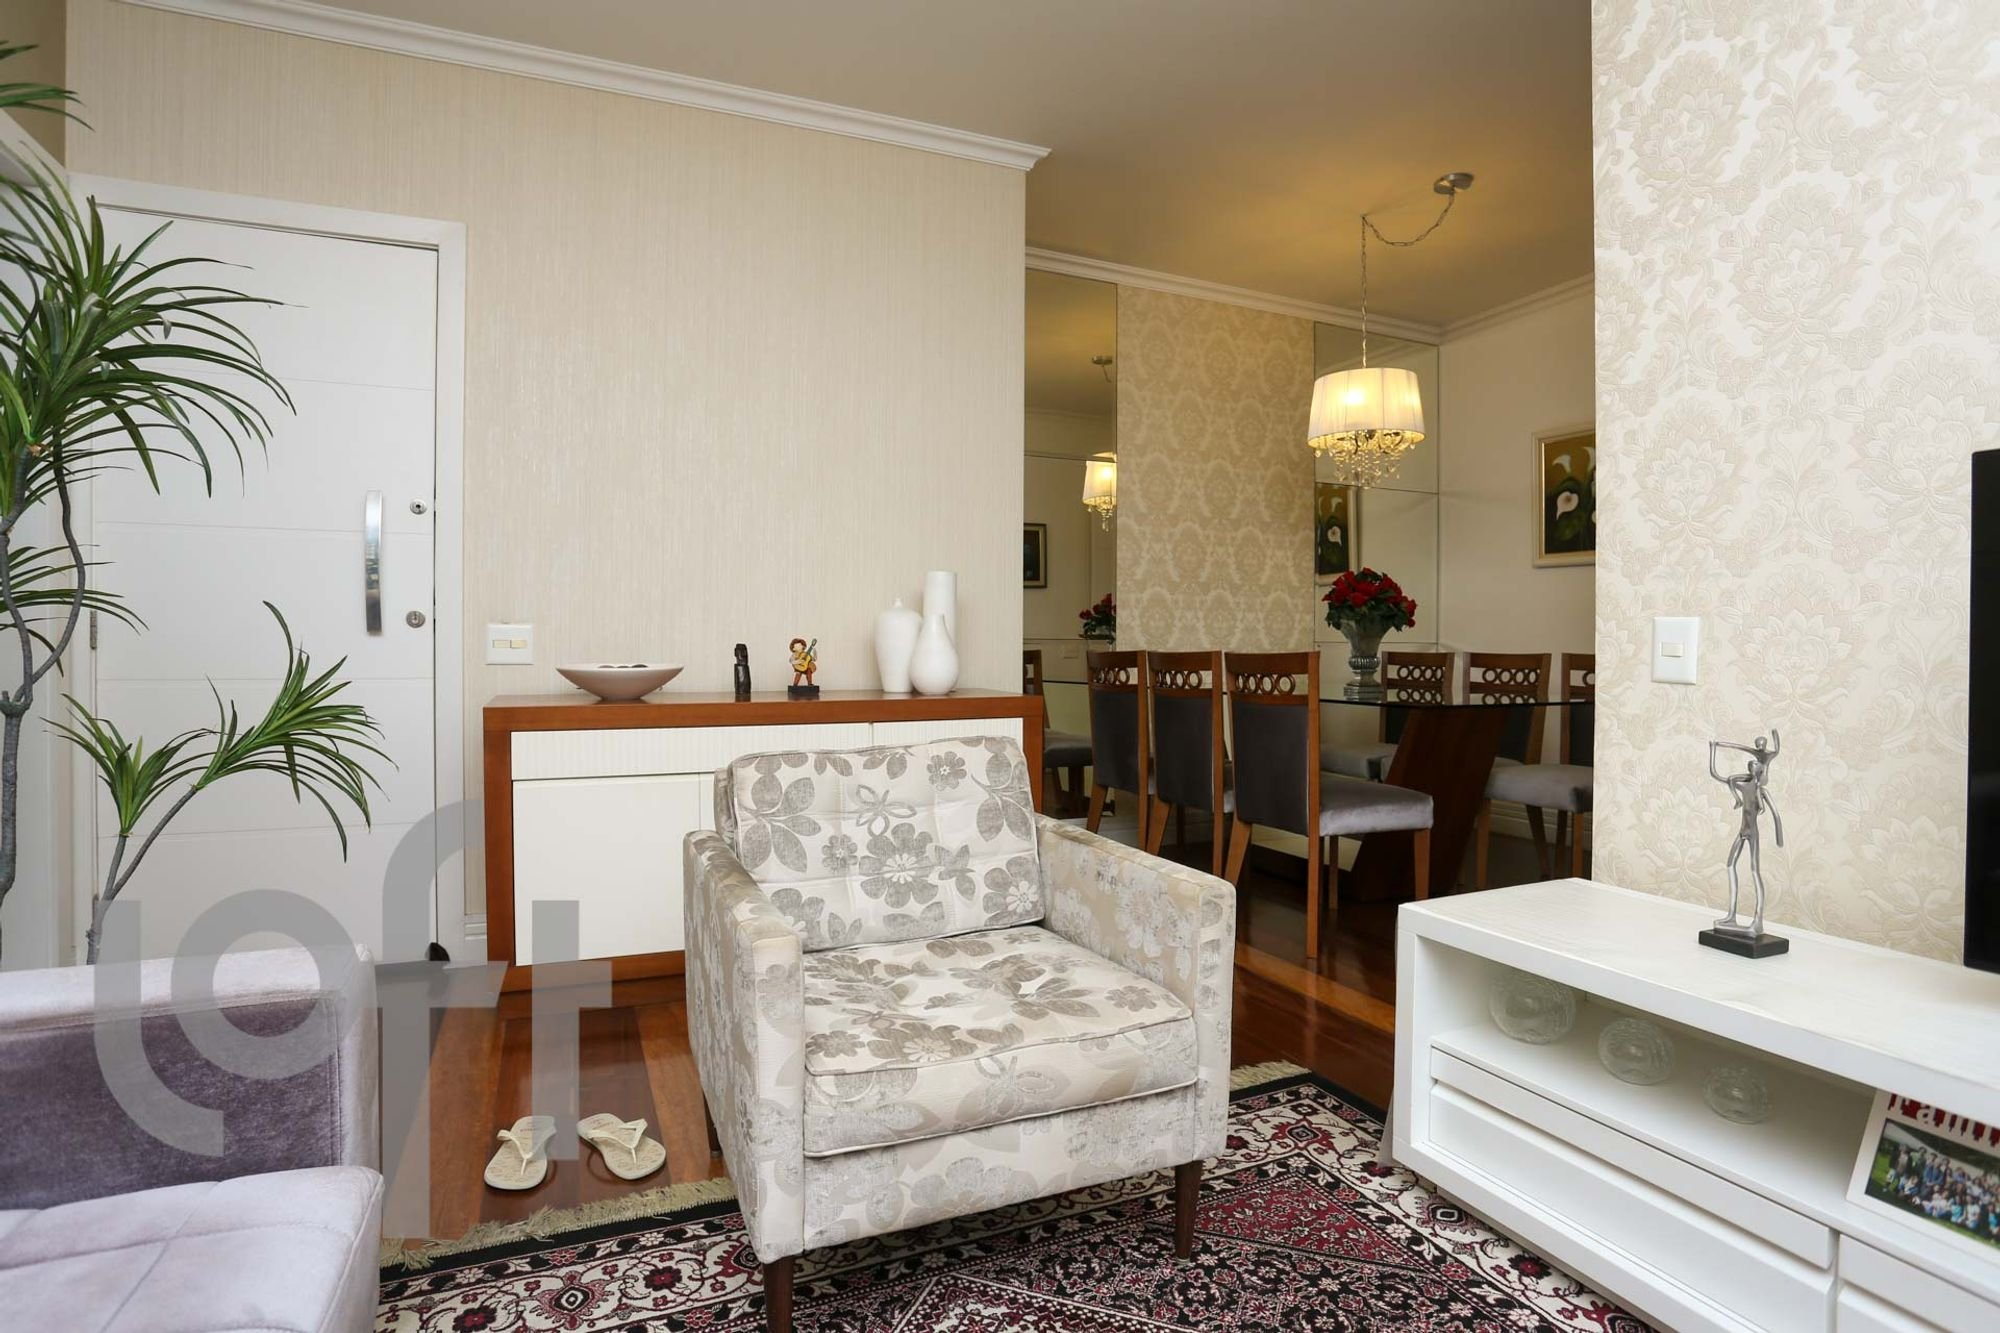 Foto de Sala com vaso de planta, sofá, vaso, tigela, cadeira